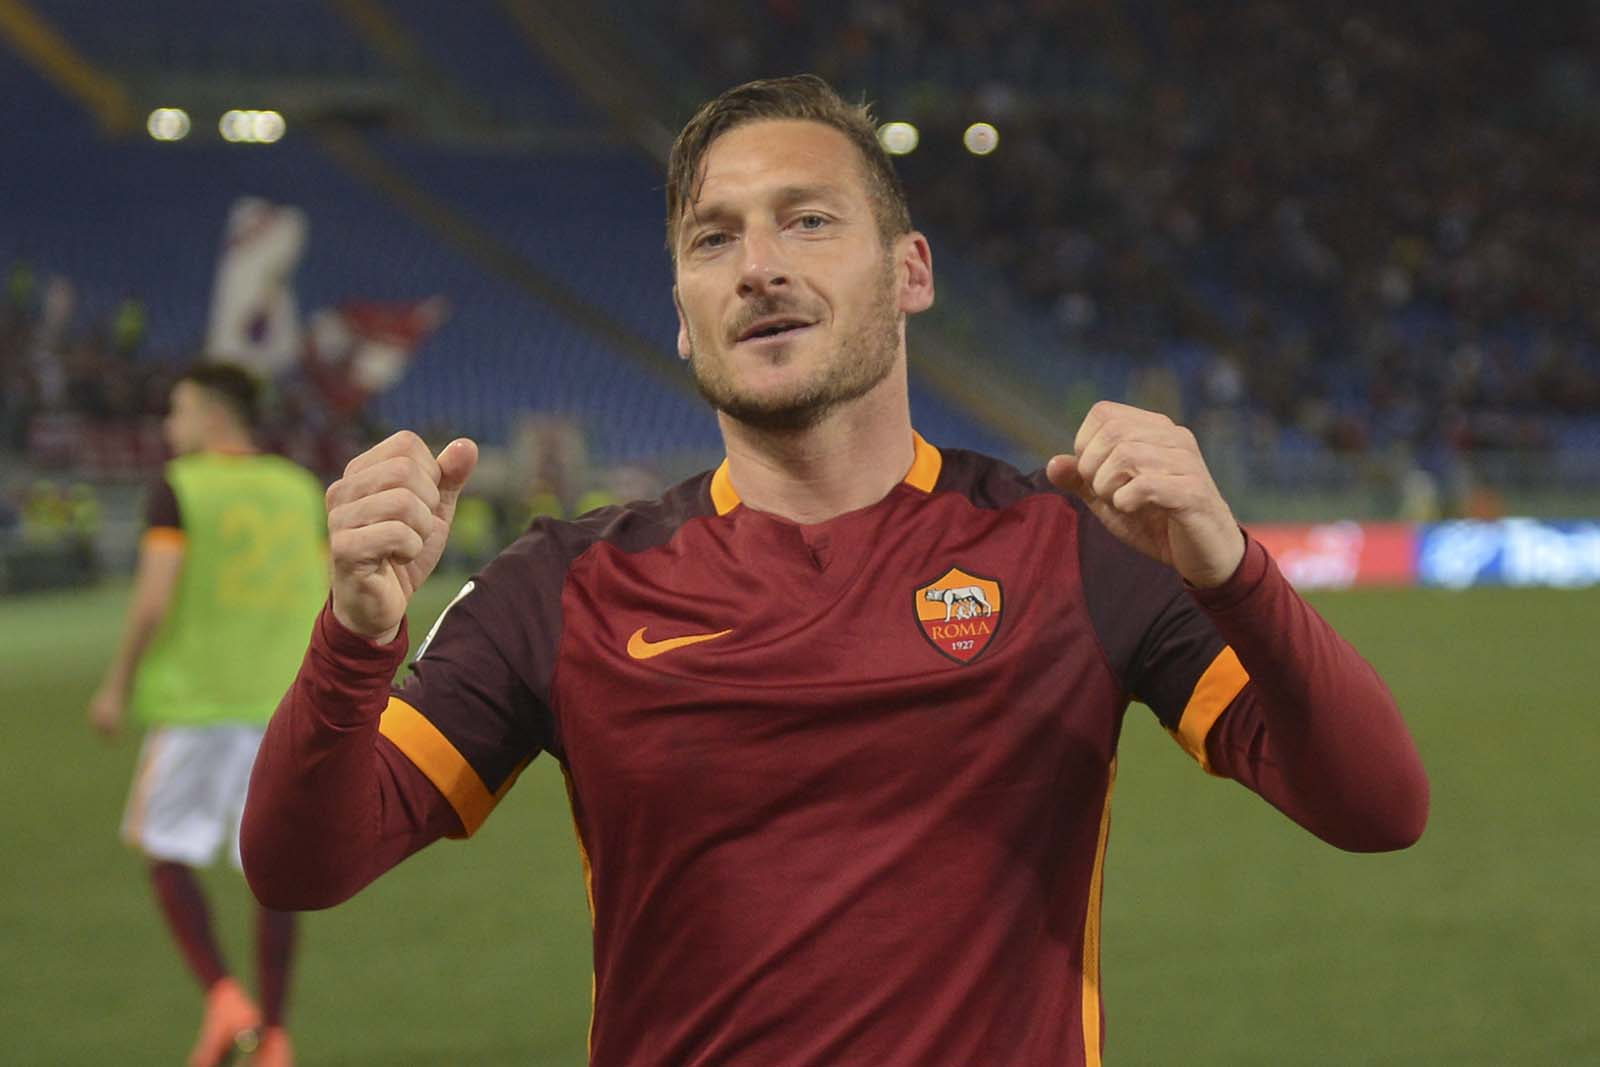 Gonzalo Higuain alla Juve, Totti definisce